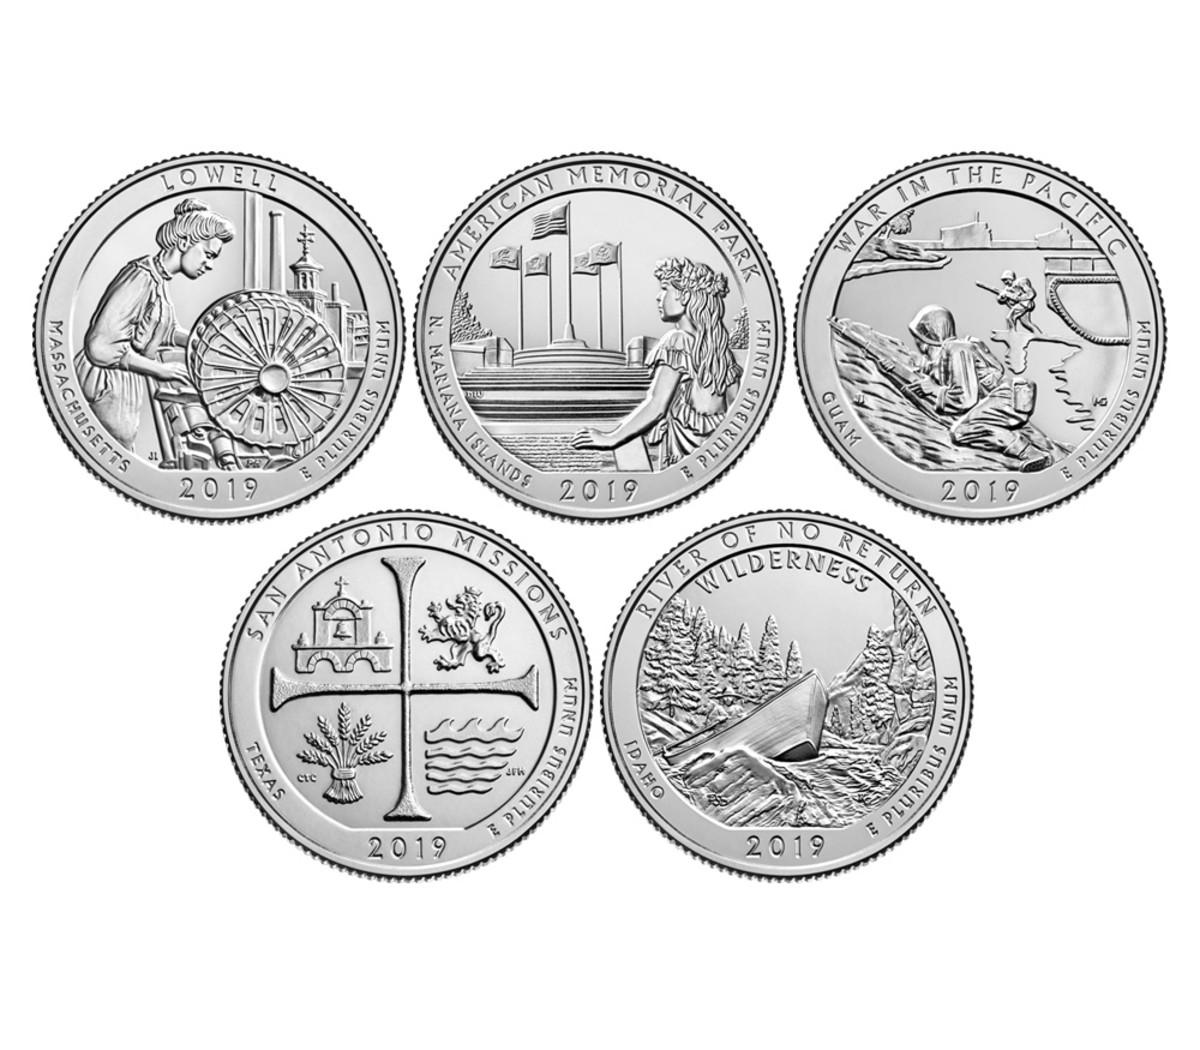 Closeup of coin reverses